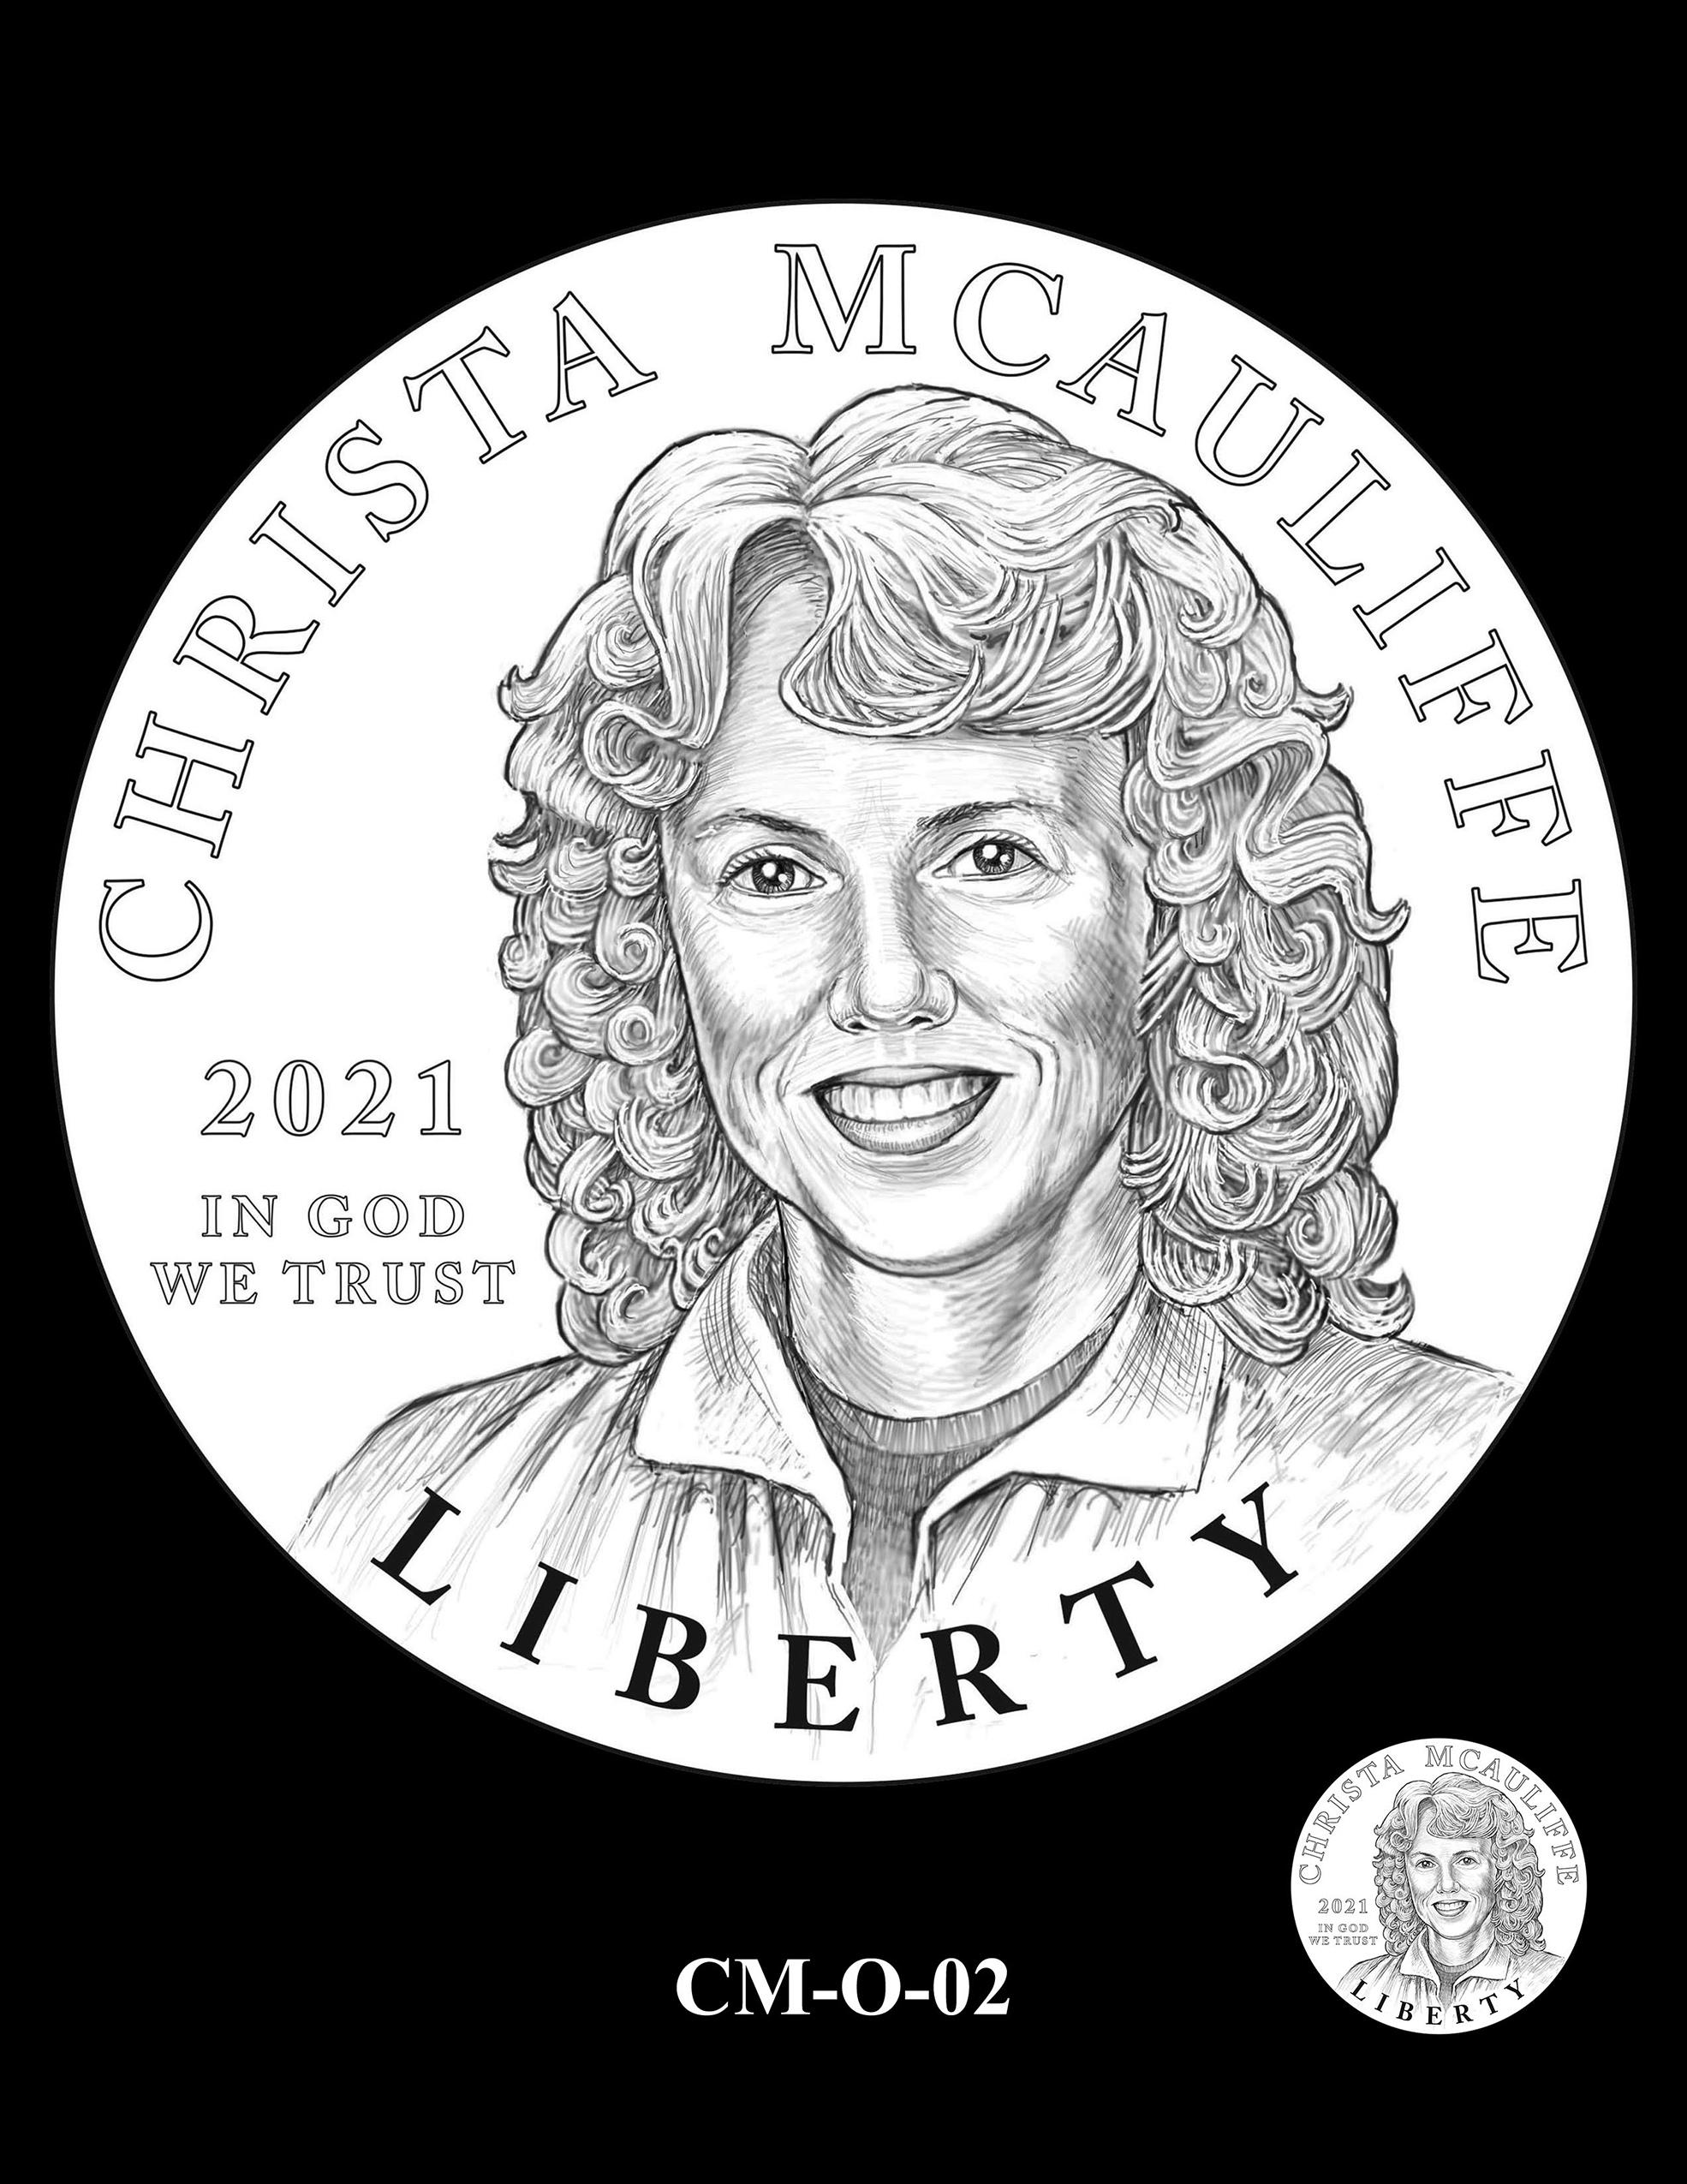 CM-O-02 -- 2021 Christa McAuliffe Commemorative Coin